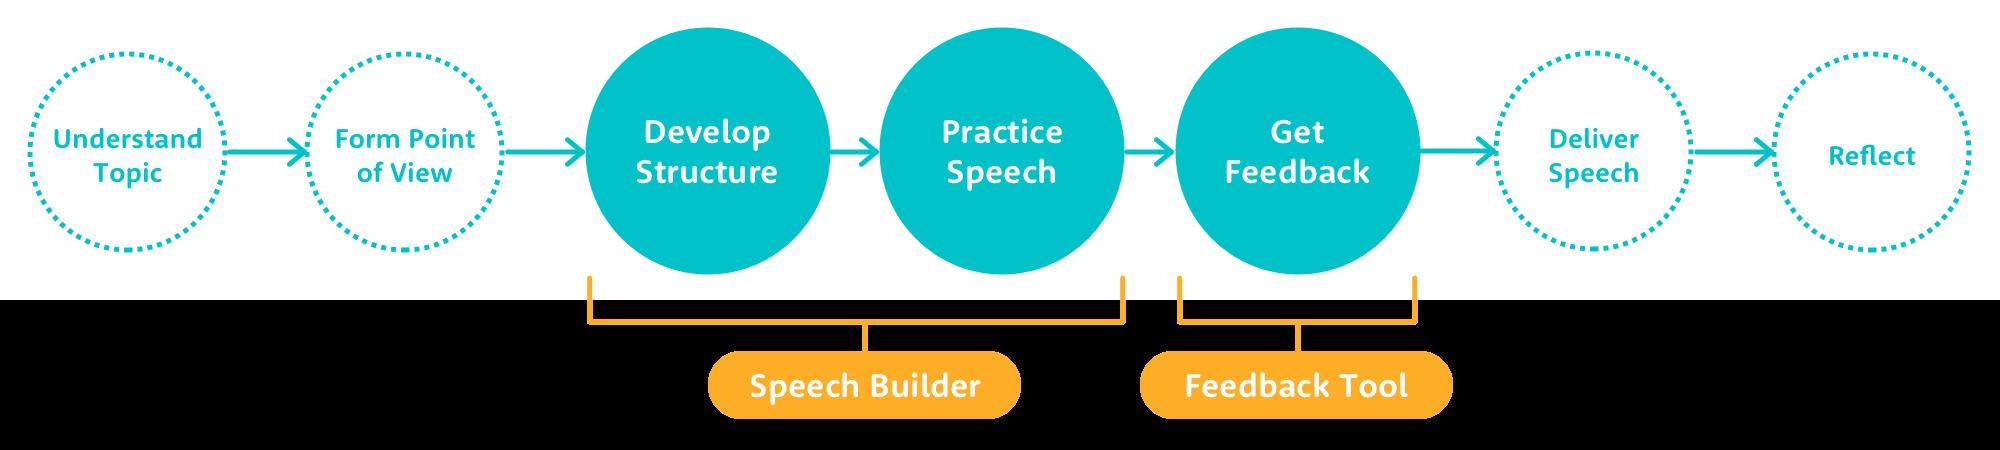 podium_Public_Speaking_Framework_Concept.png